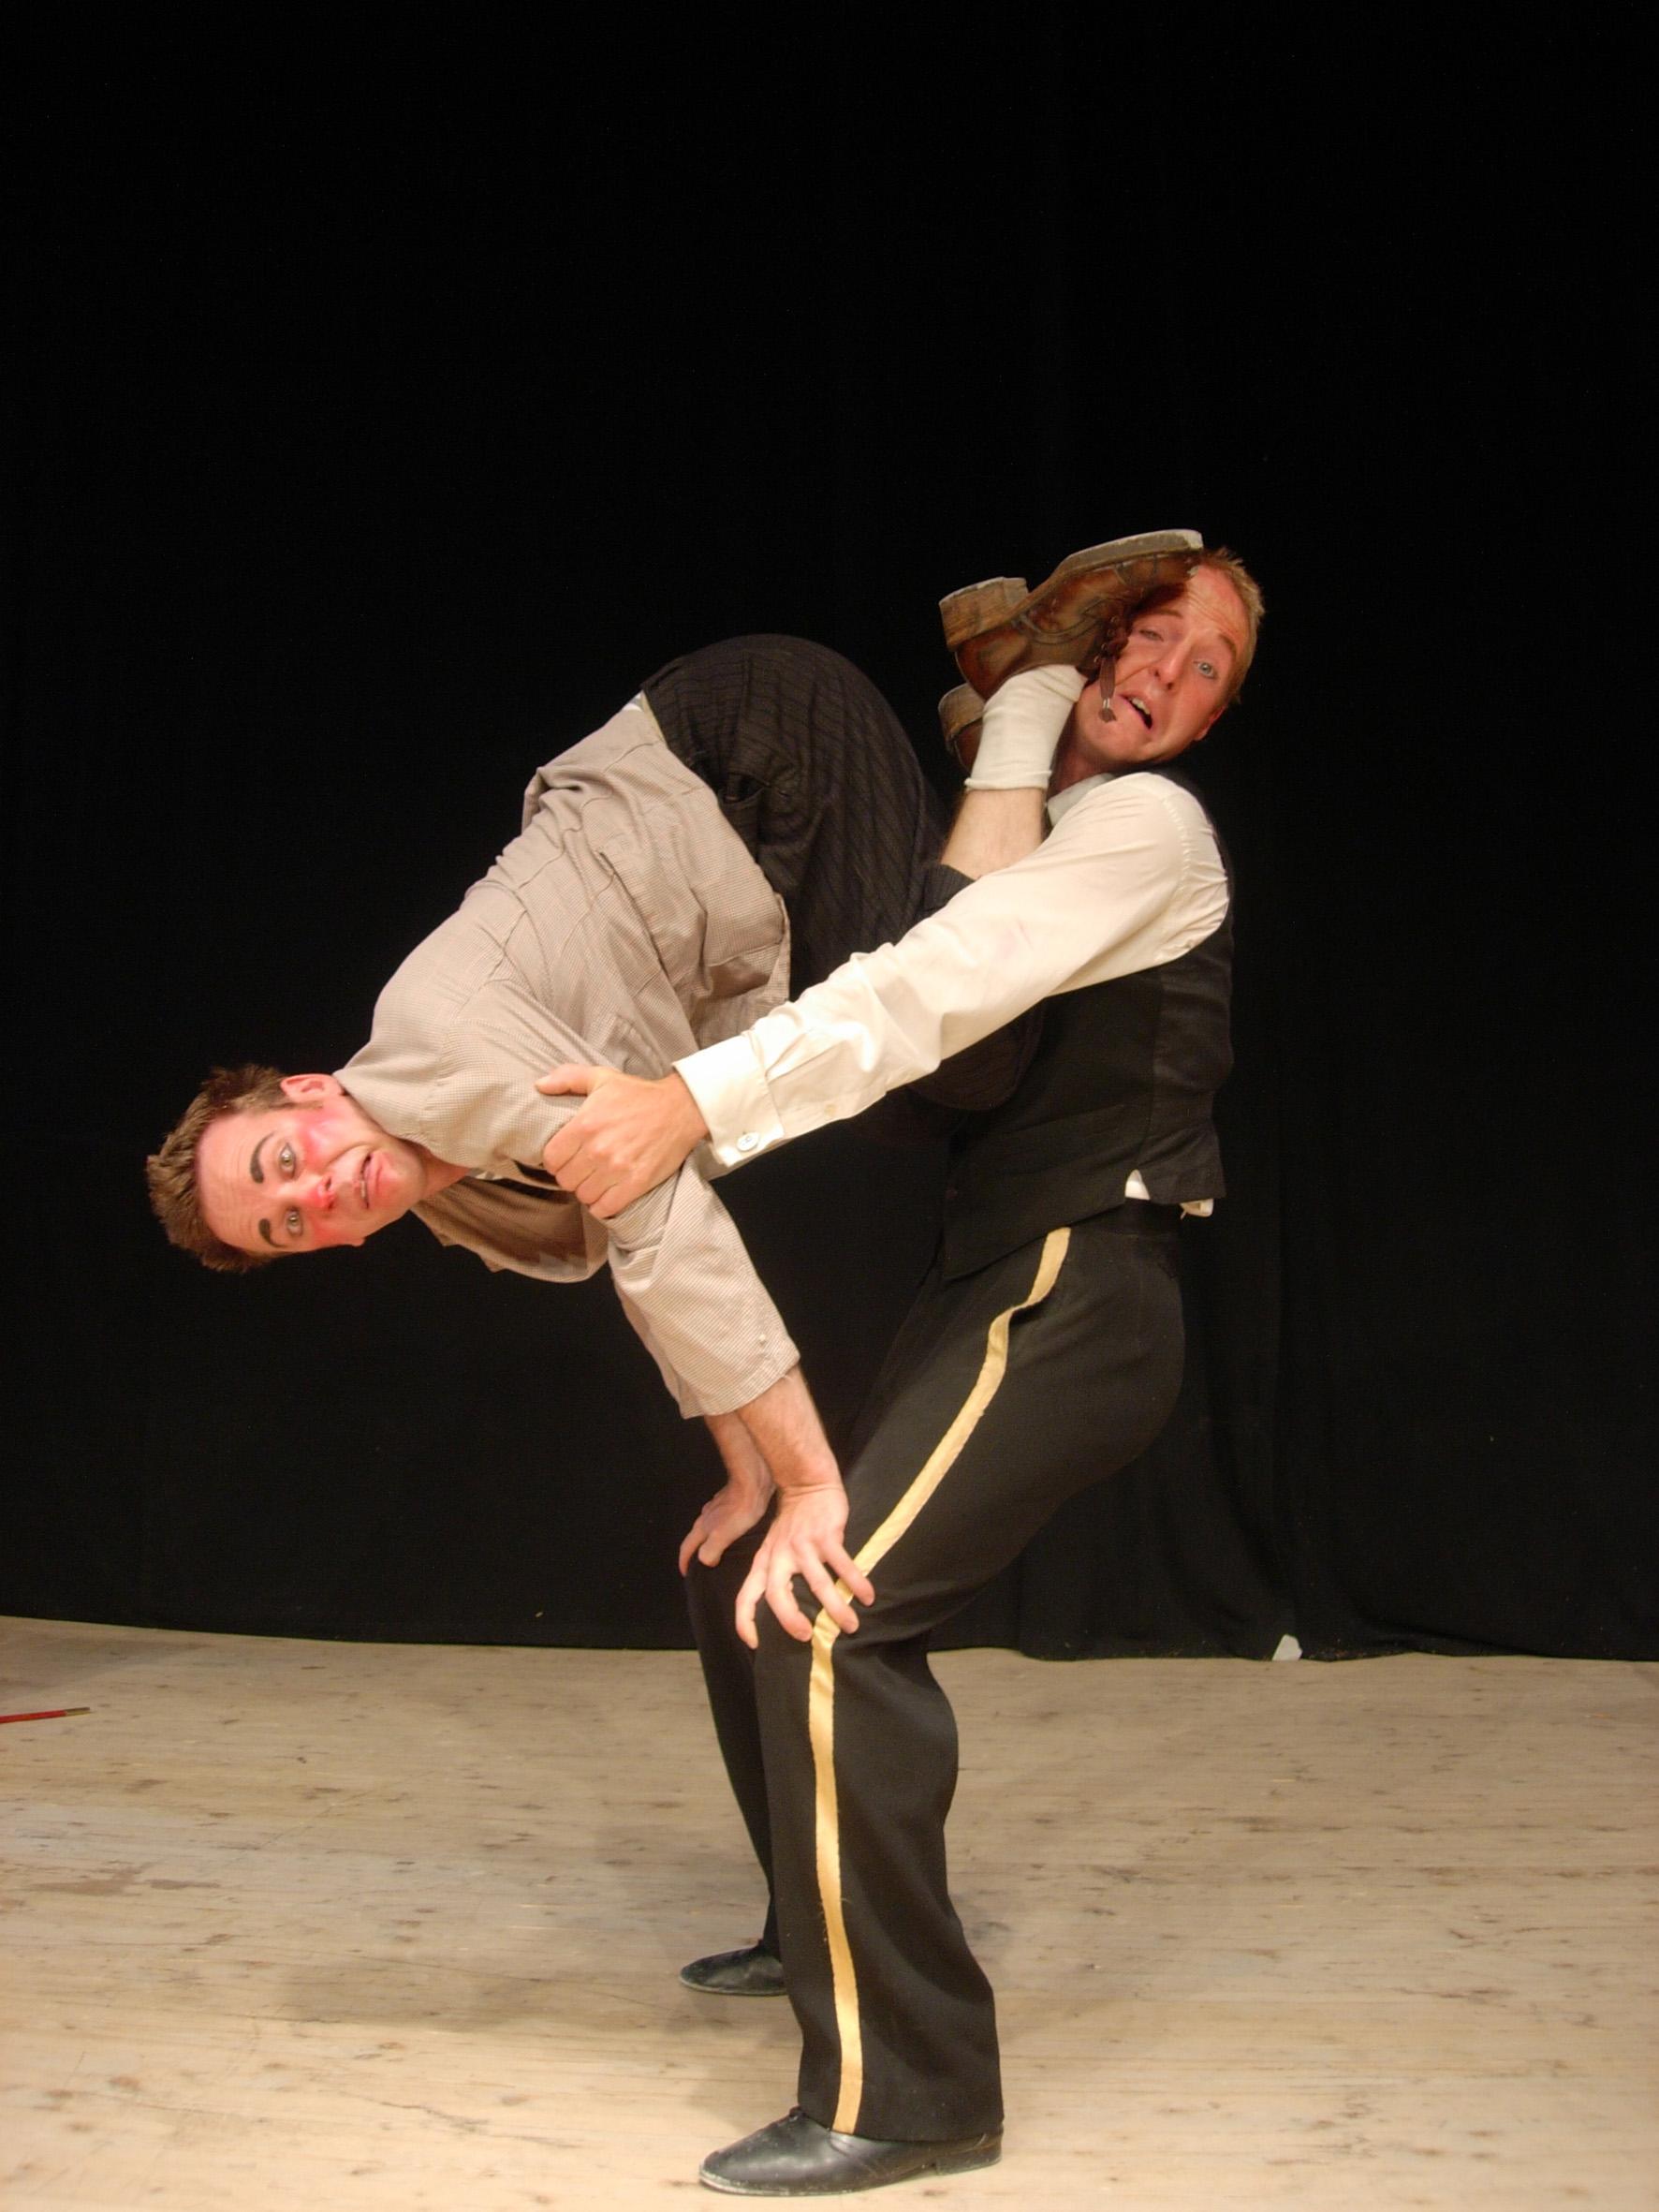 Gilbert & Oleg begeistern mit Zauberei, Akrobatik und Komik. Bild zVg.